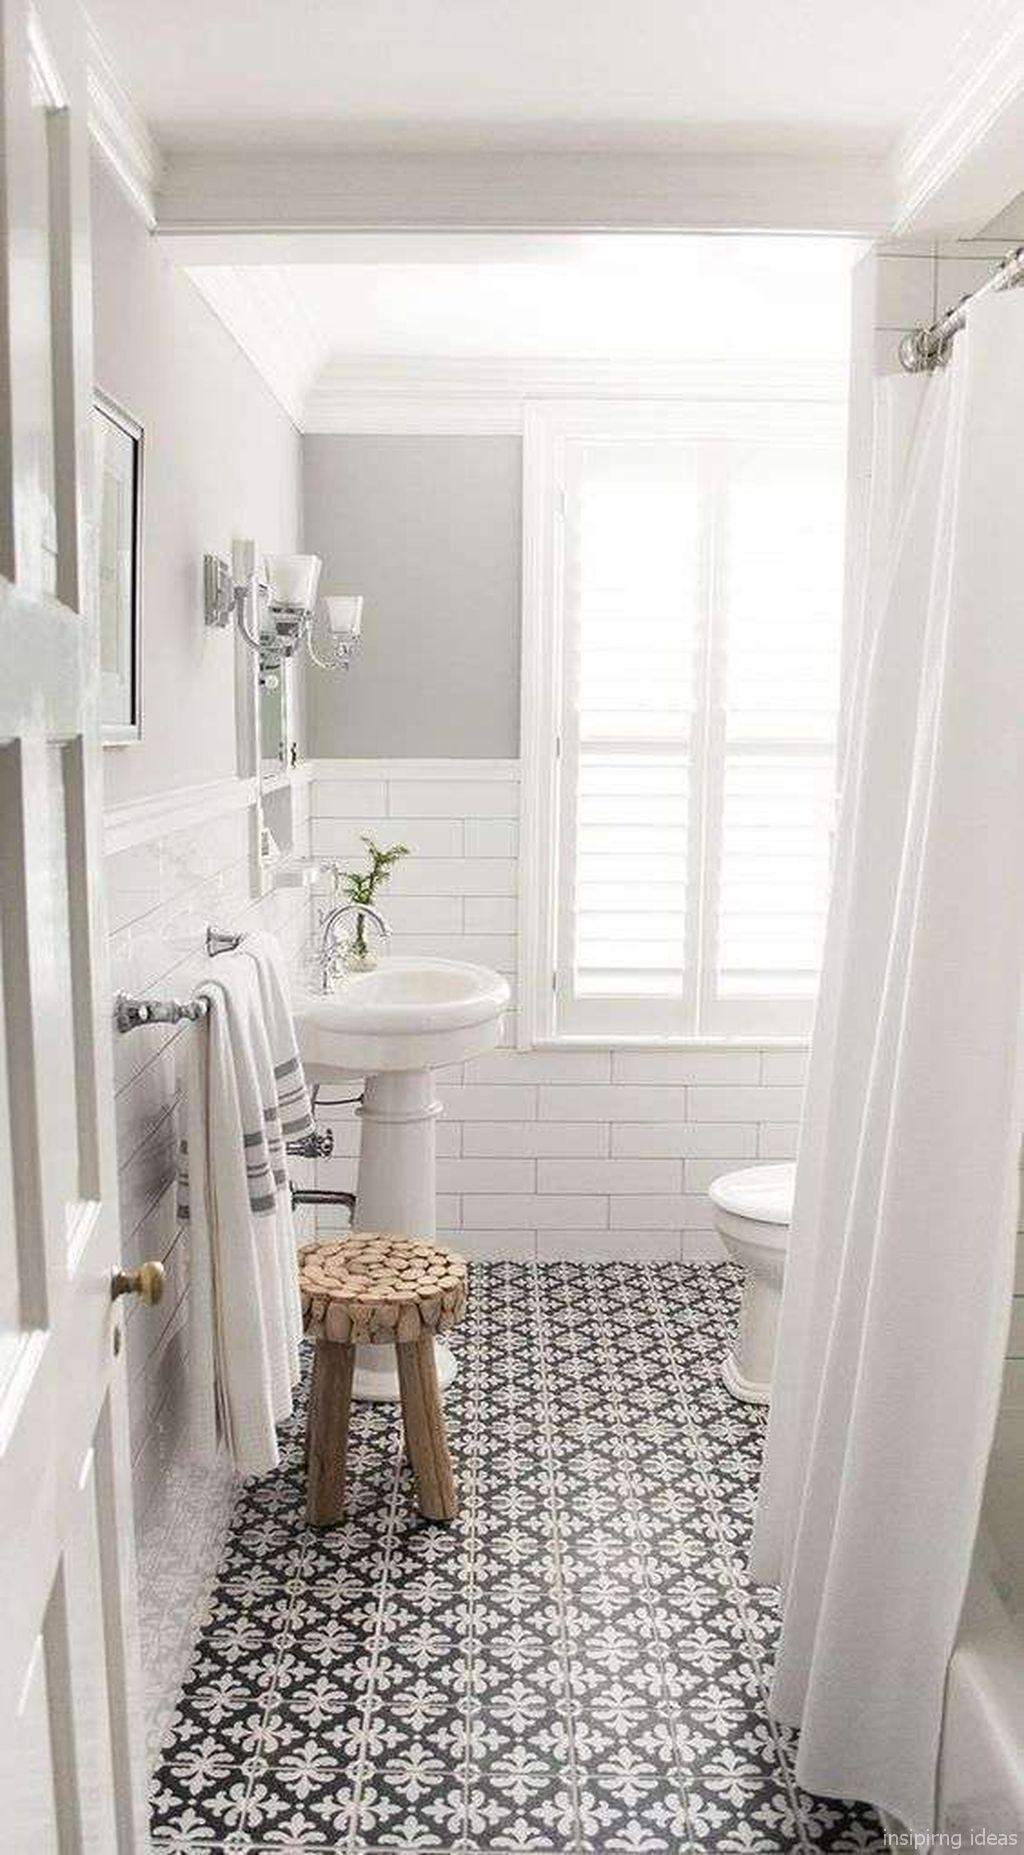 Nice 67 Incredible Modern Farmhouse Bathroom Tile Ideas ... on Rustic Farmhouse Bathroom Tile  id=46392